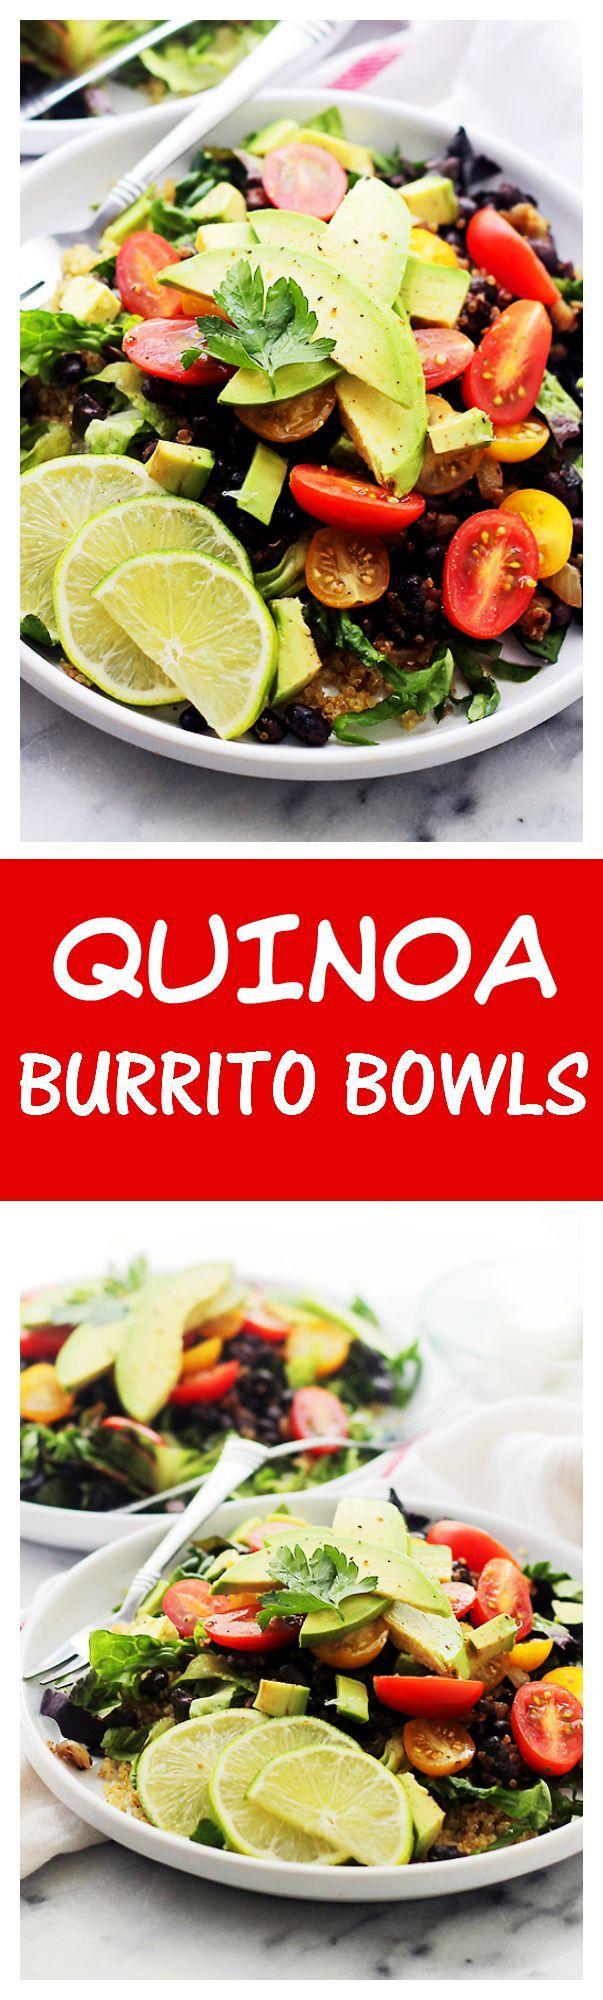 Burrito Bowls   www.diethood.com   Healthy, homemade burrito bowls ...